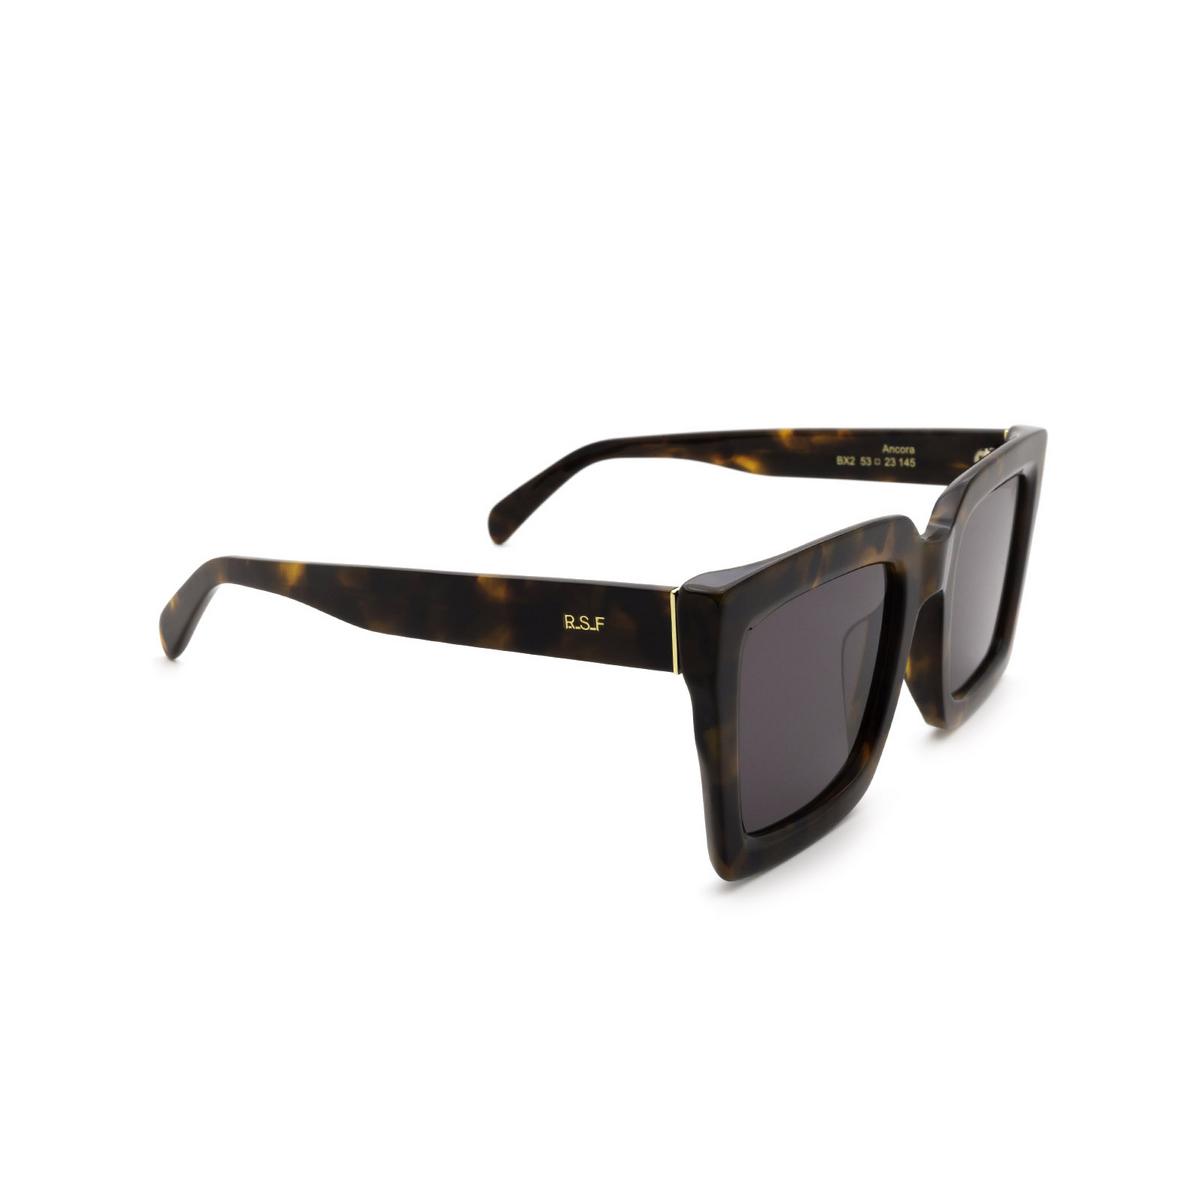 Retrosuperfuture® Square Sunglasses: Ancora color Classic Havana BX2 - three-quarters view.